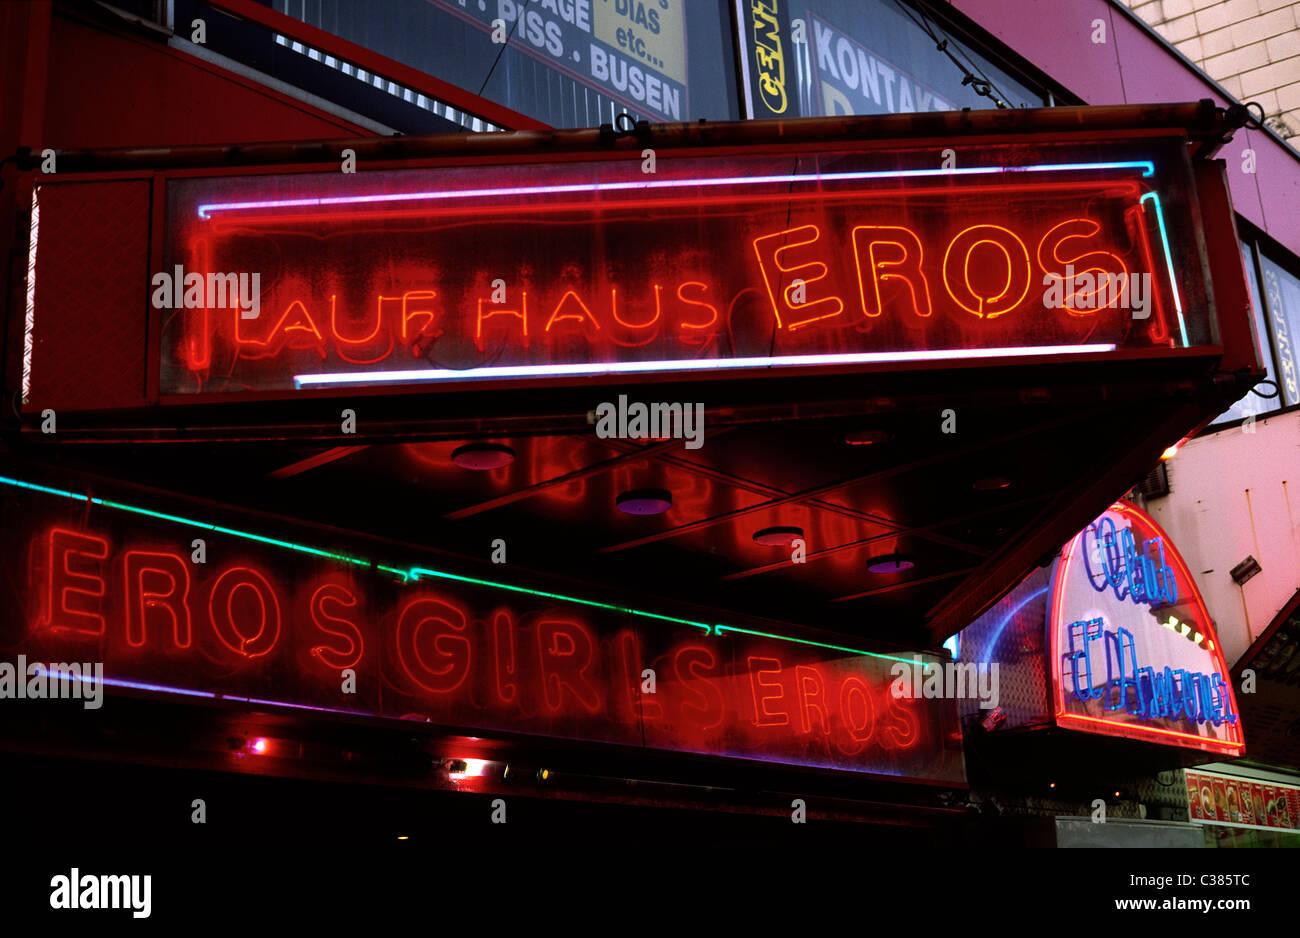 Eros laufhaus hamburg